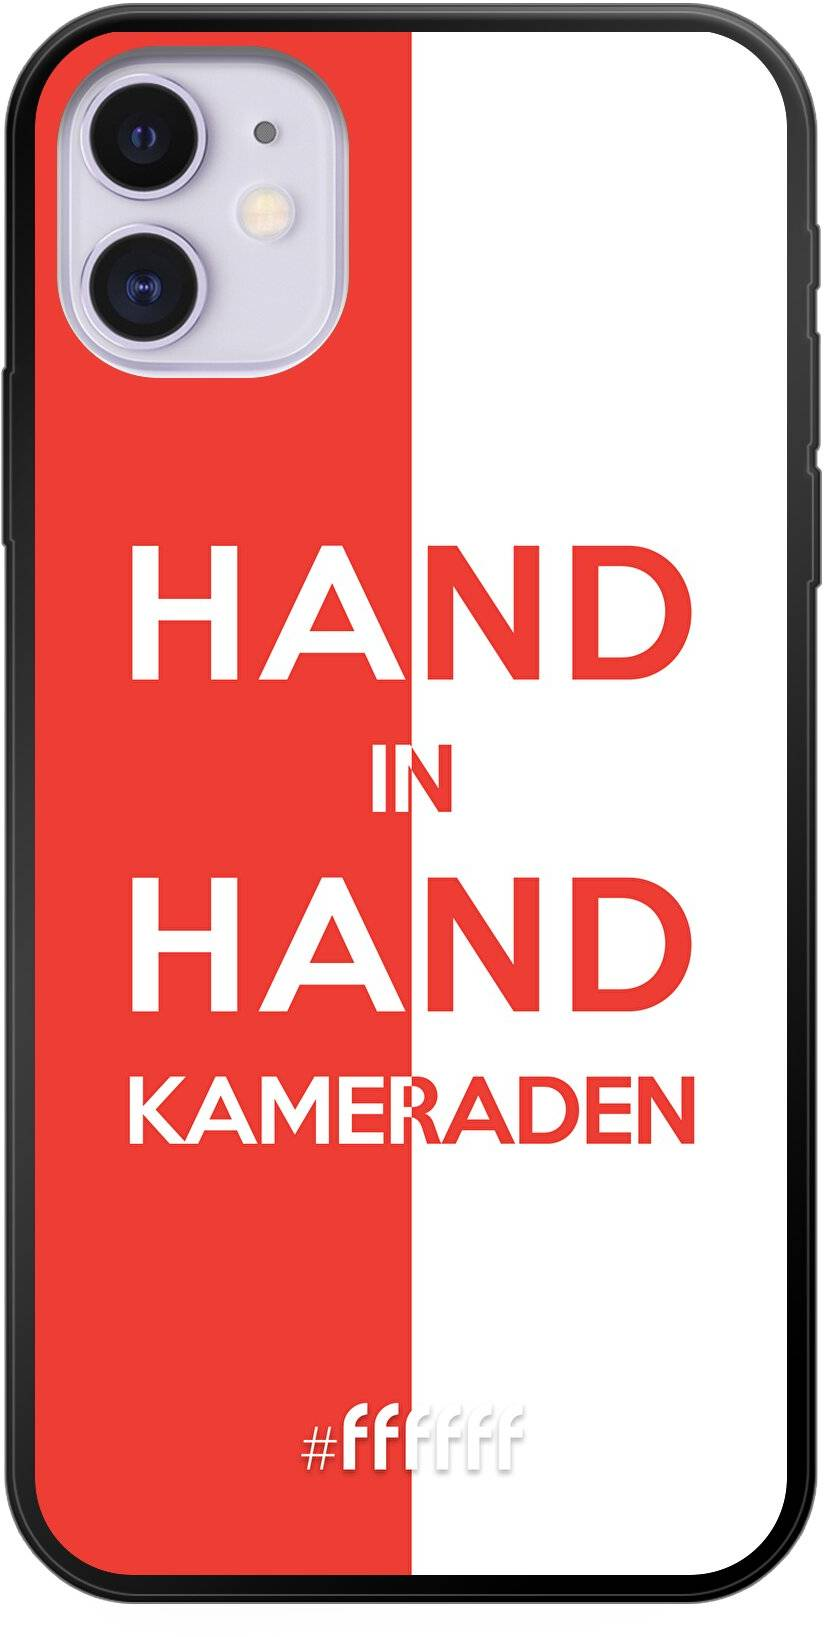 Feyenoord - Hand in hand, kameraden iPhone 11